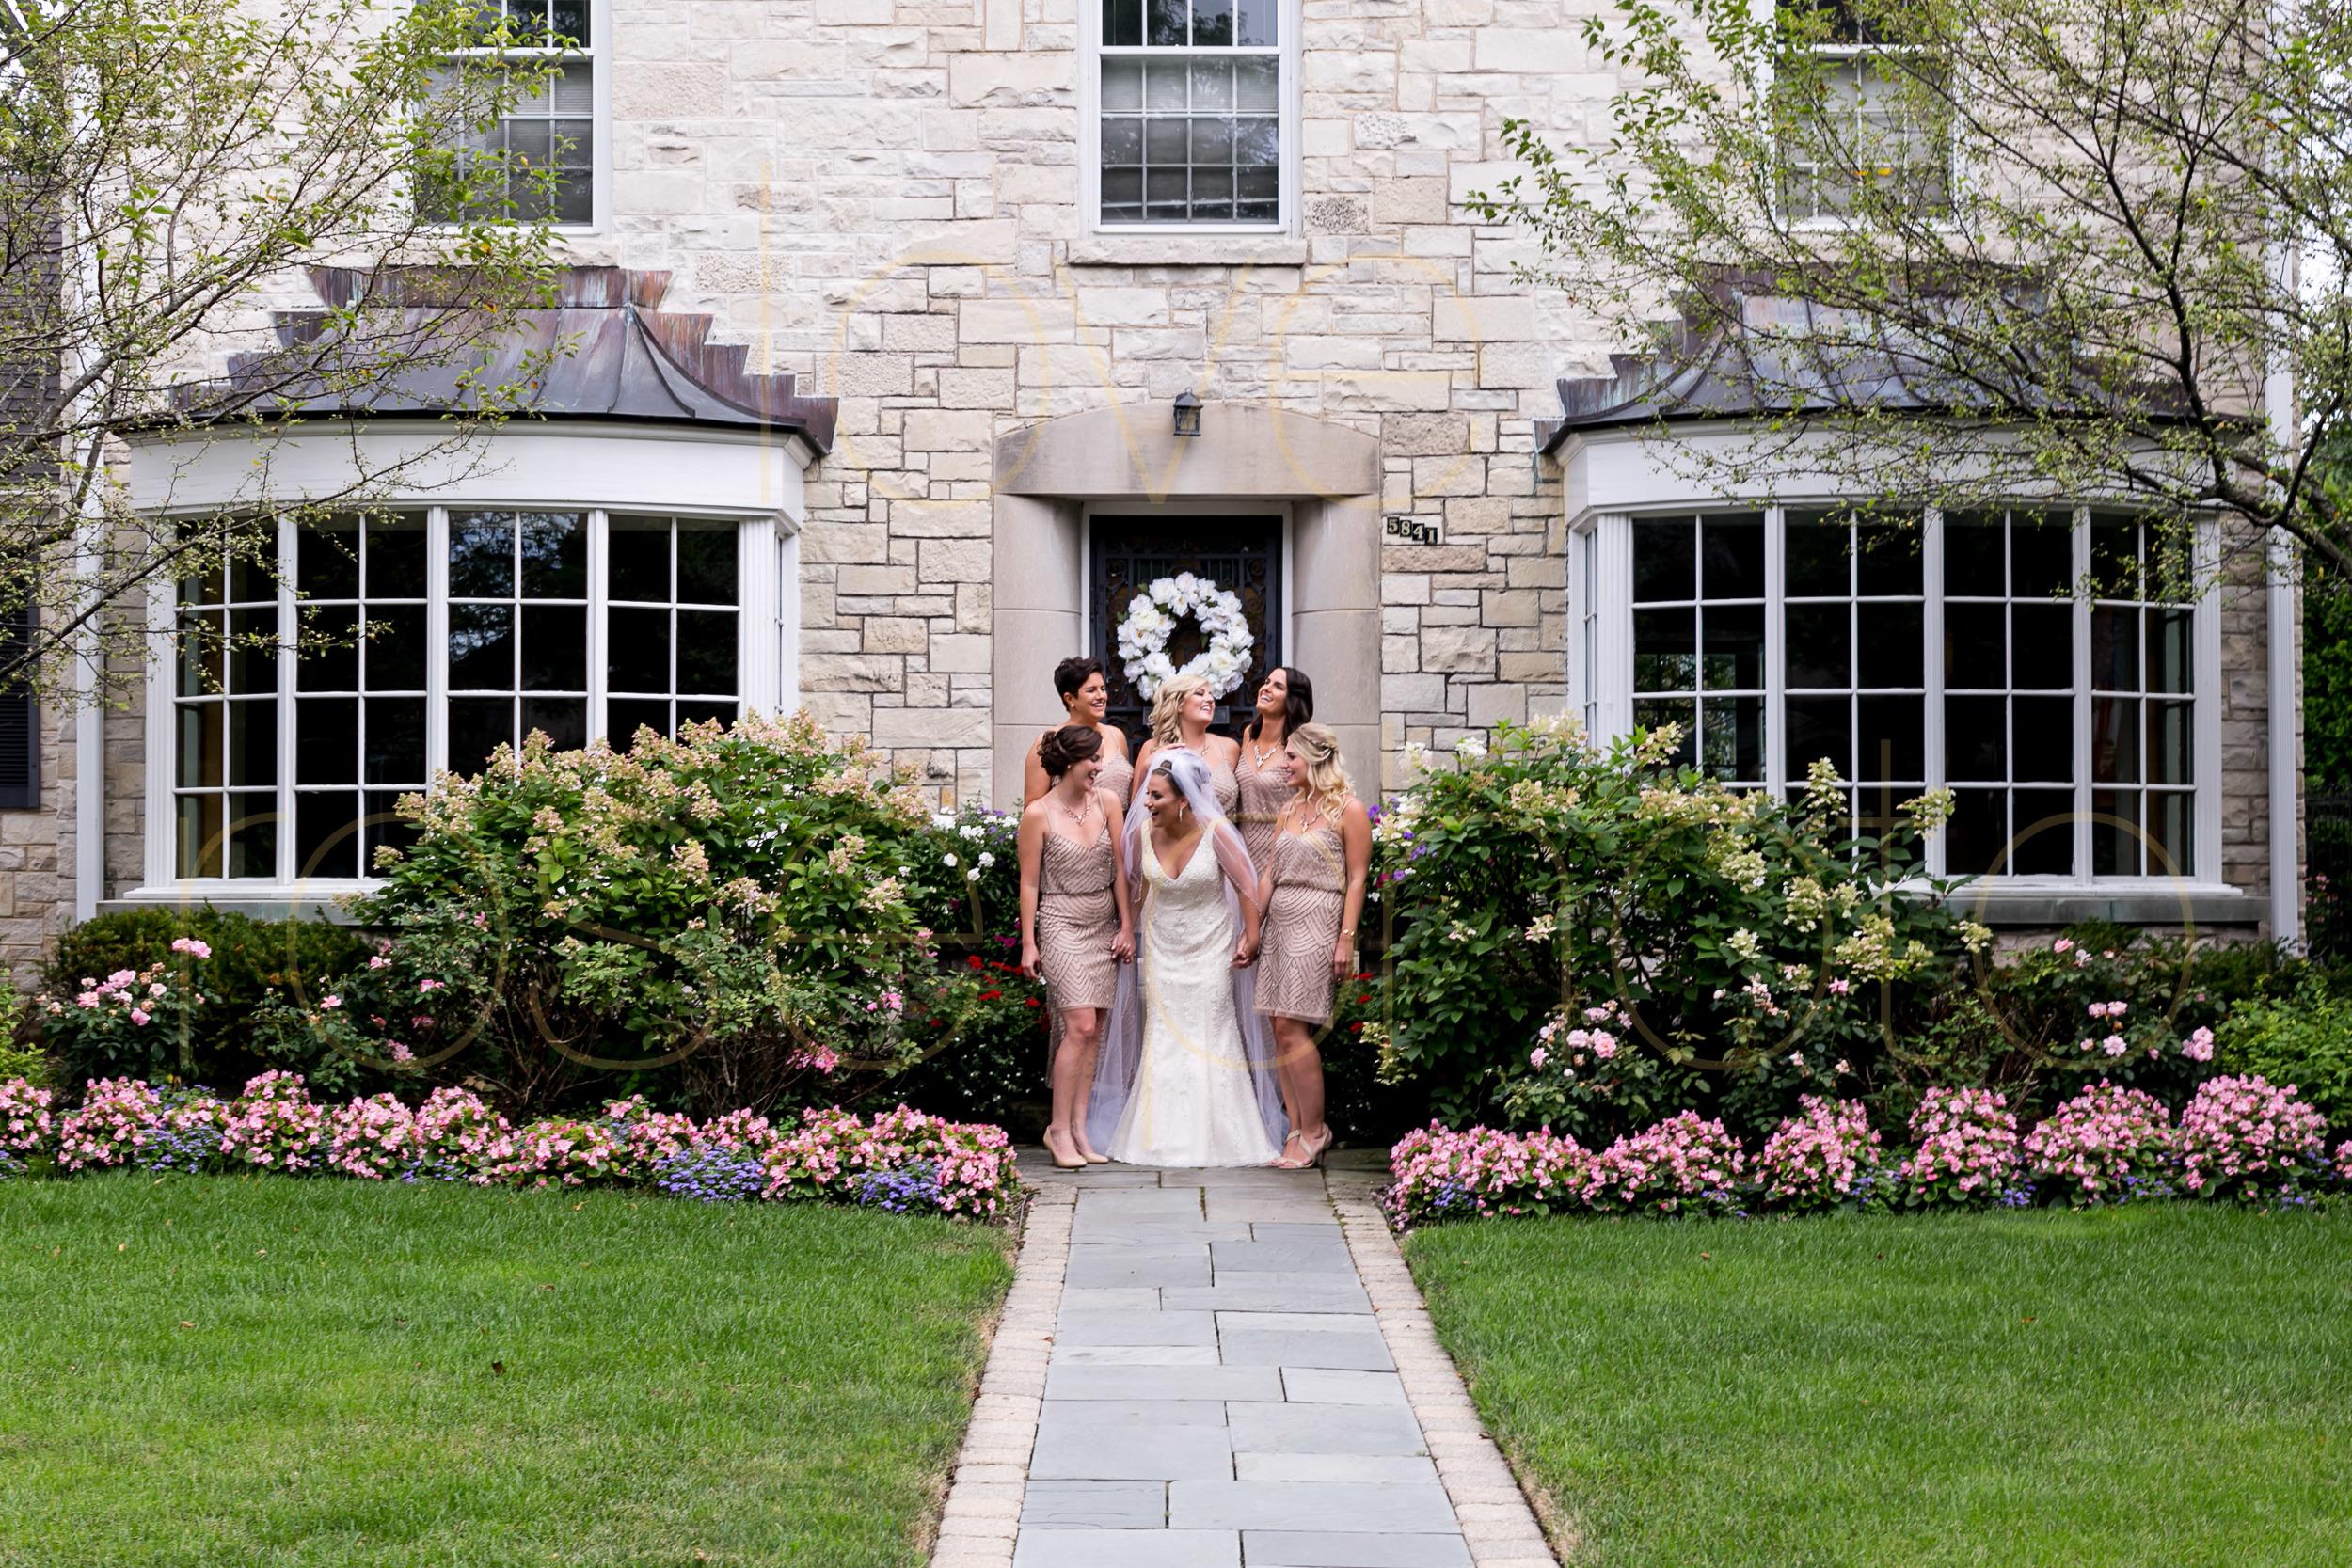 chicago photographer destination wedding best of the knot big day photos Salvatore's Lincoln Park -19.jpg